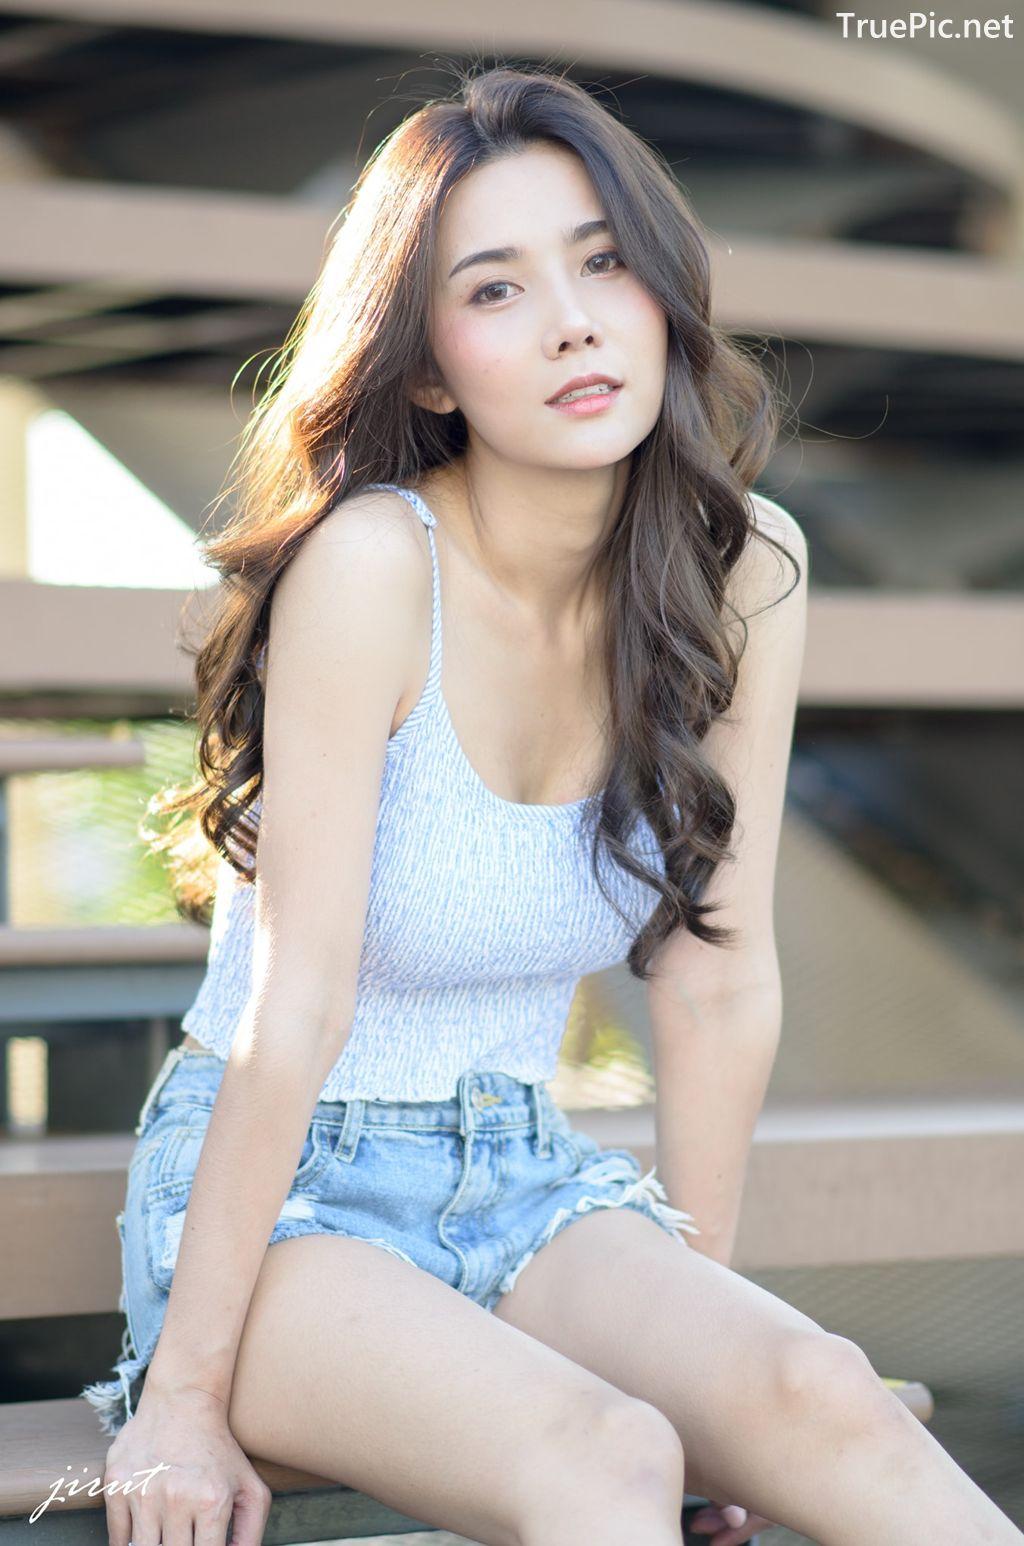 Image-Thailand-Model-Baiyok-Panachon-Cute-White-Crop-Top-and-Short-Jean-TruePic.net- Picture-2